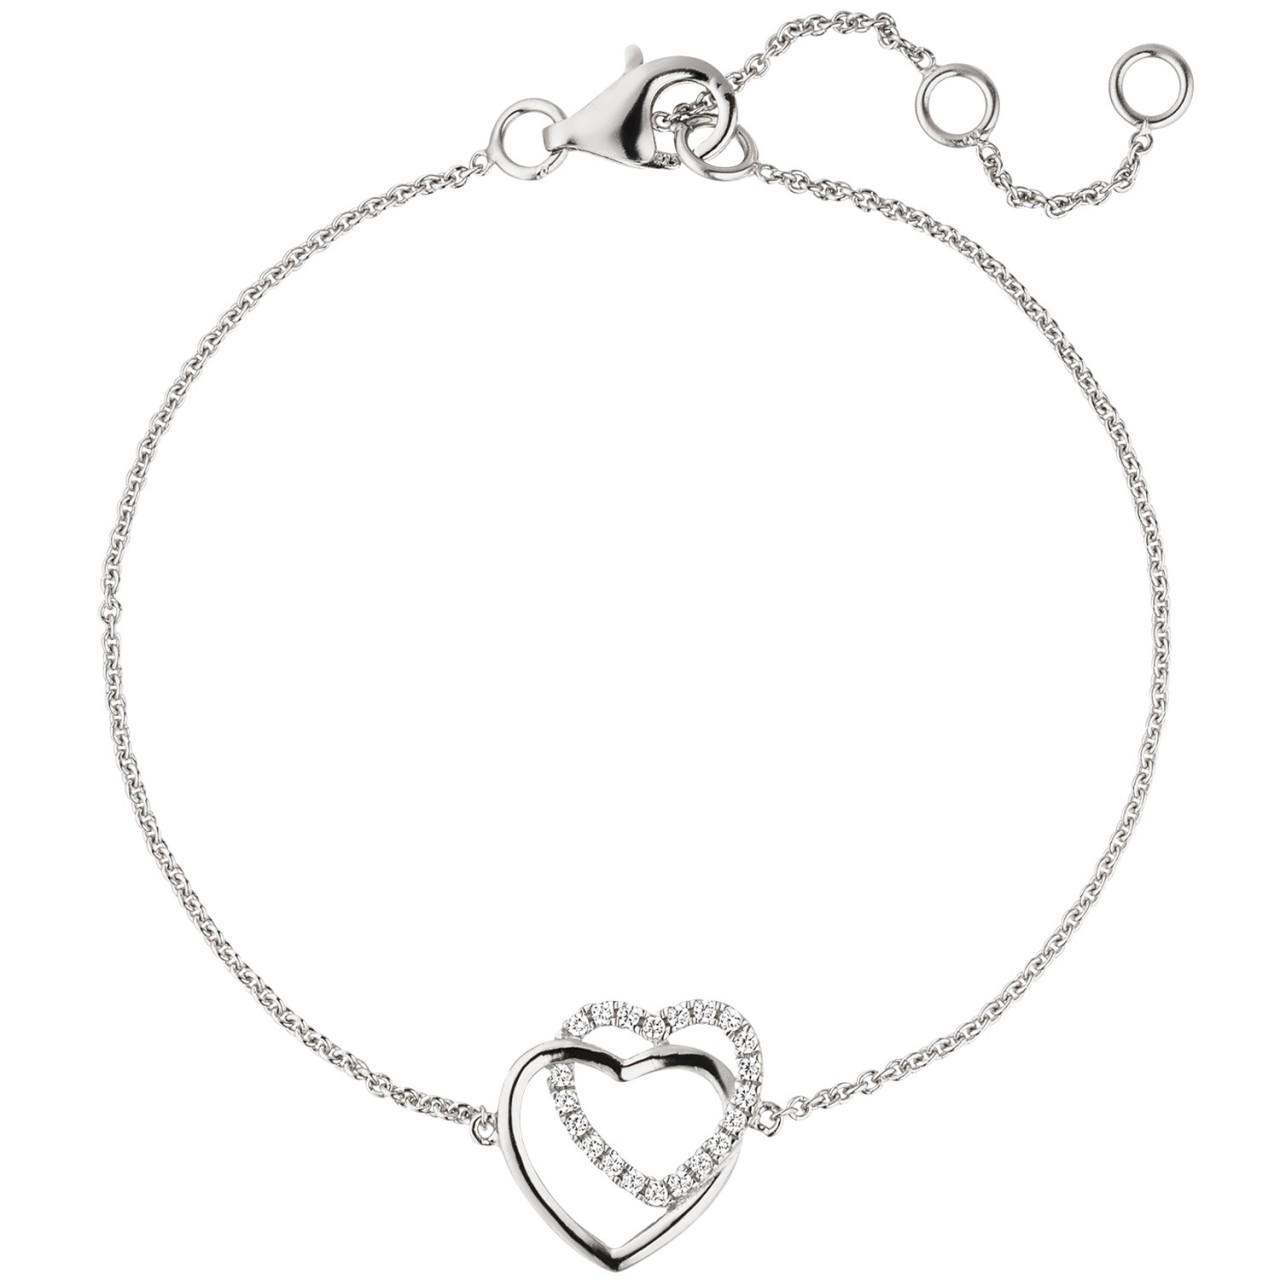 Armband Herz 925 Sterling Silber 2 Zirkonia 22 cm Silberarmband Herzarmband